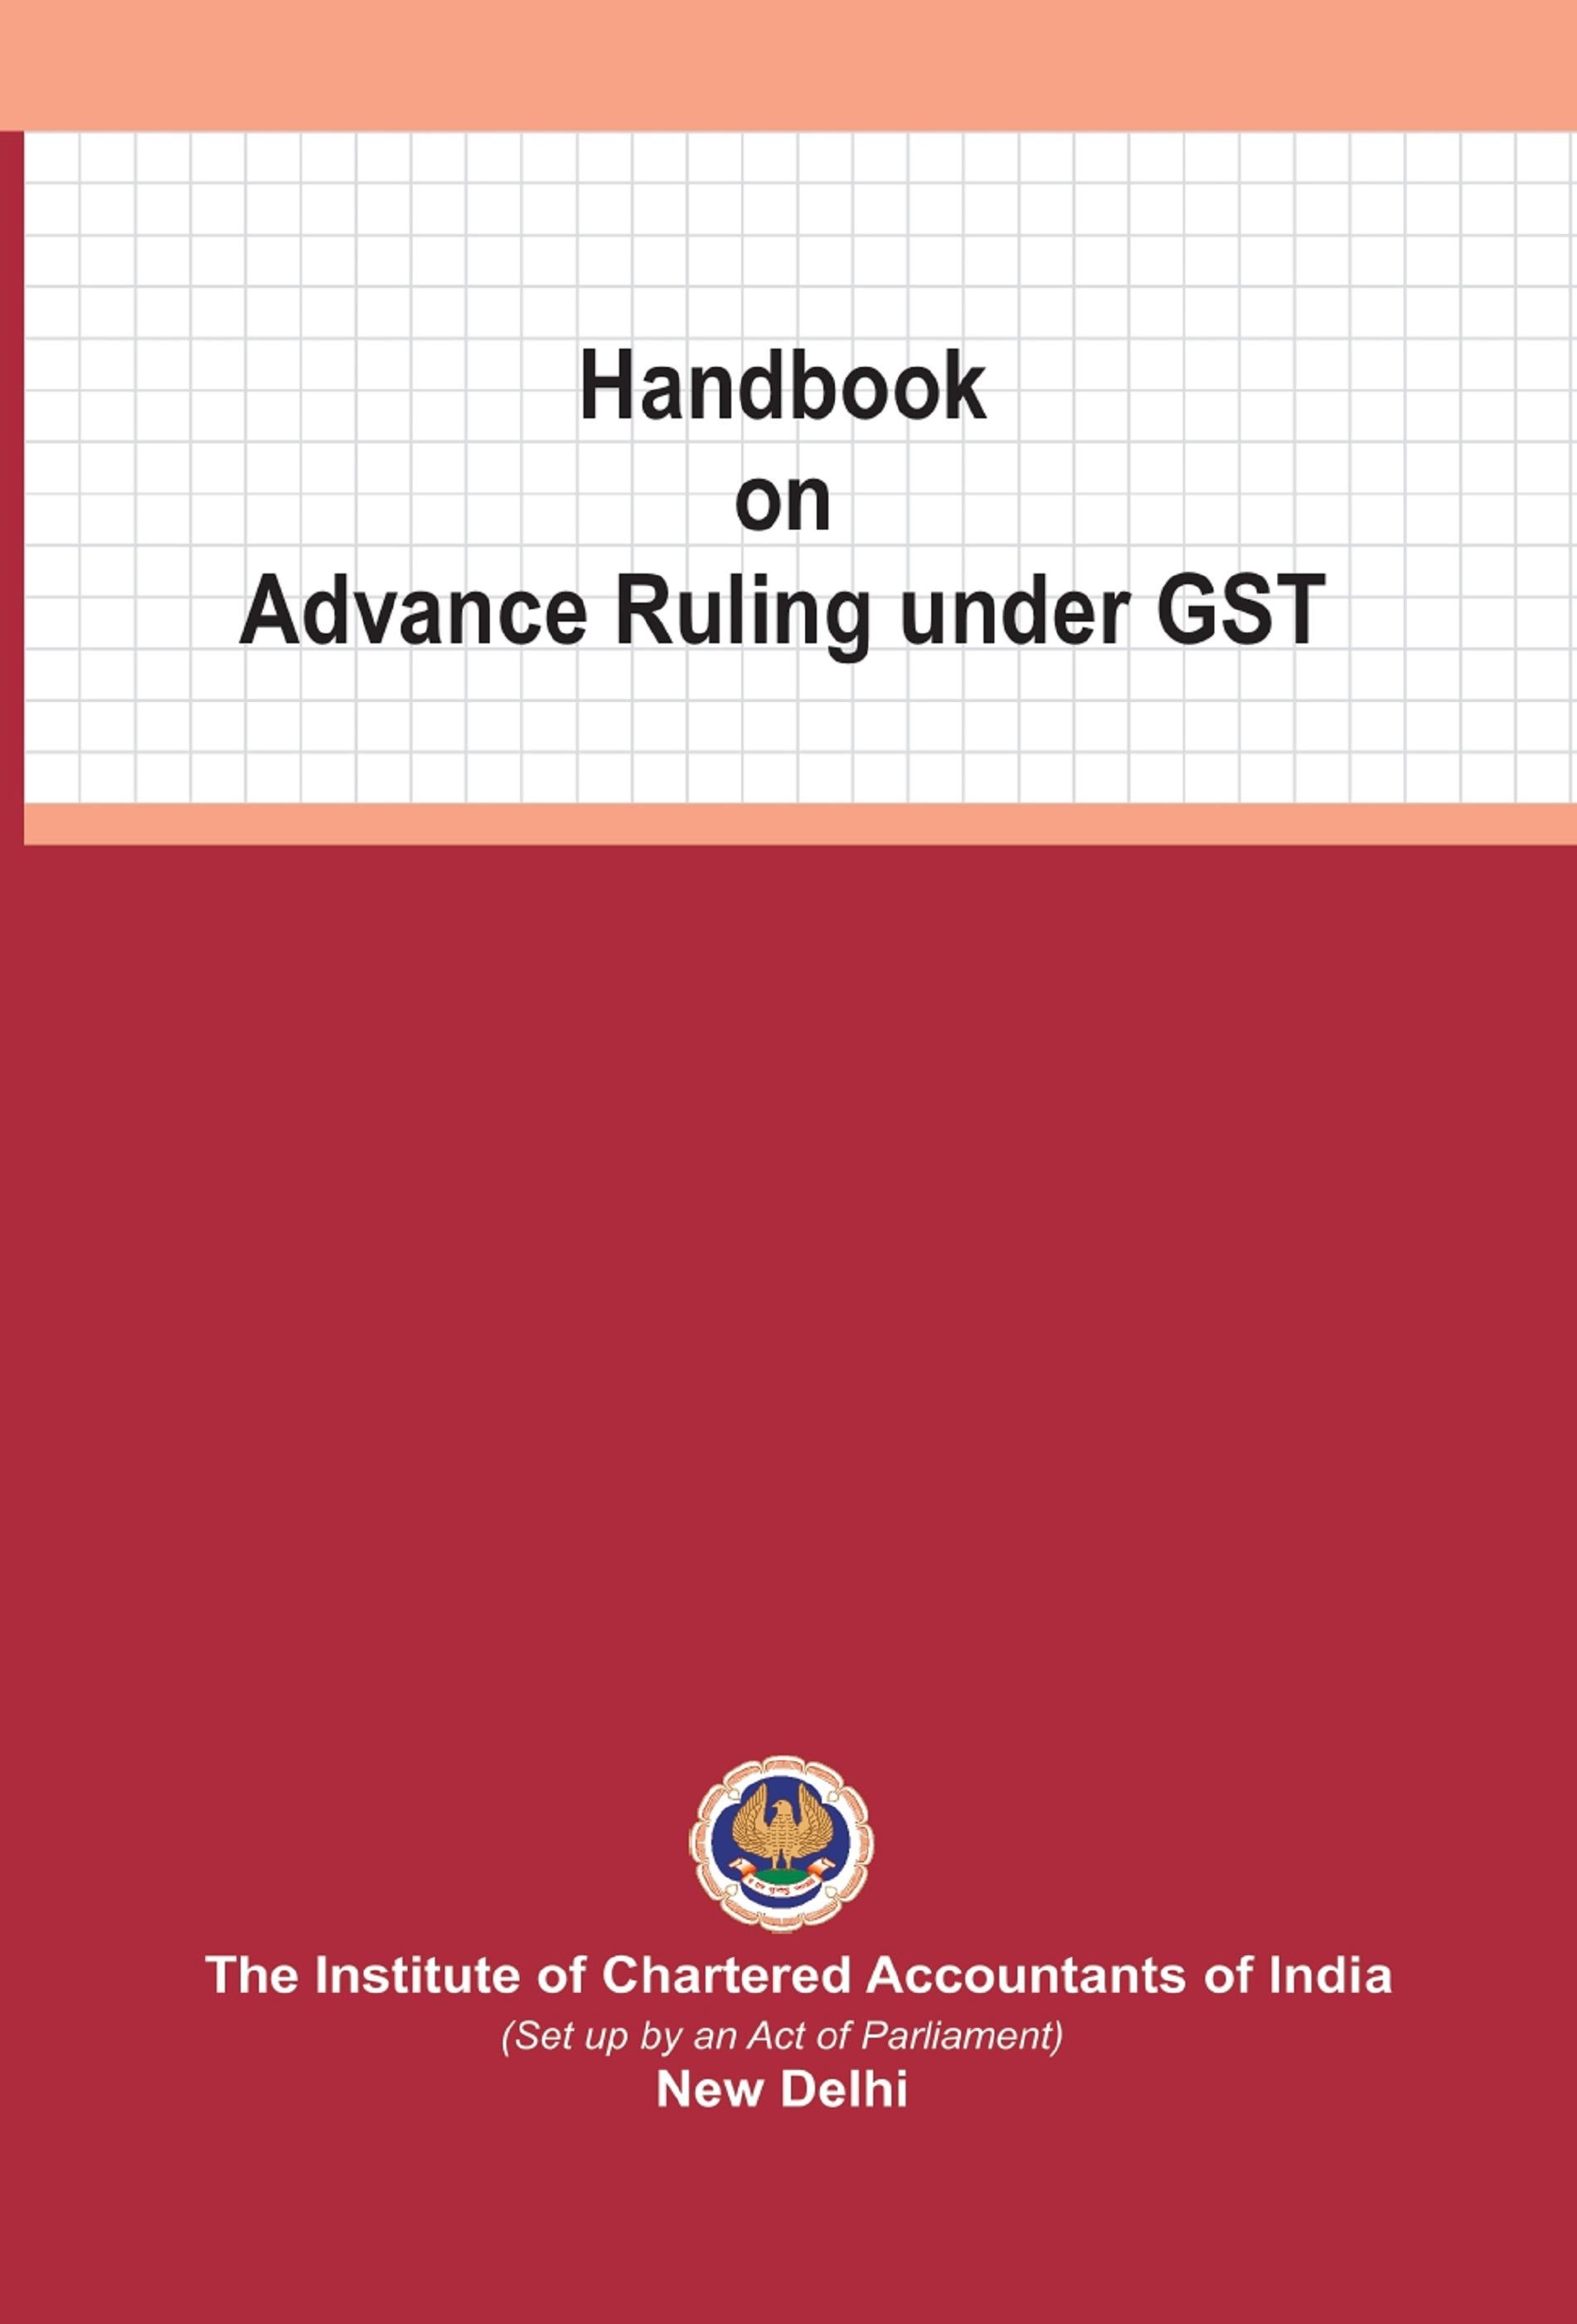 Handbook on Advance Ruling under GST (May, 2020)